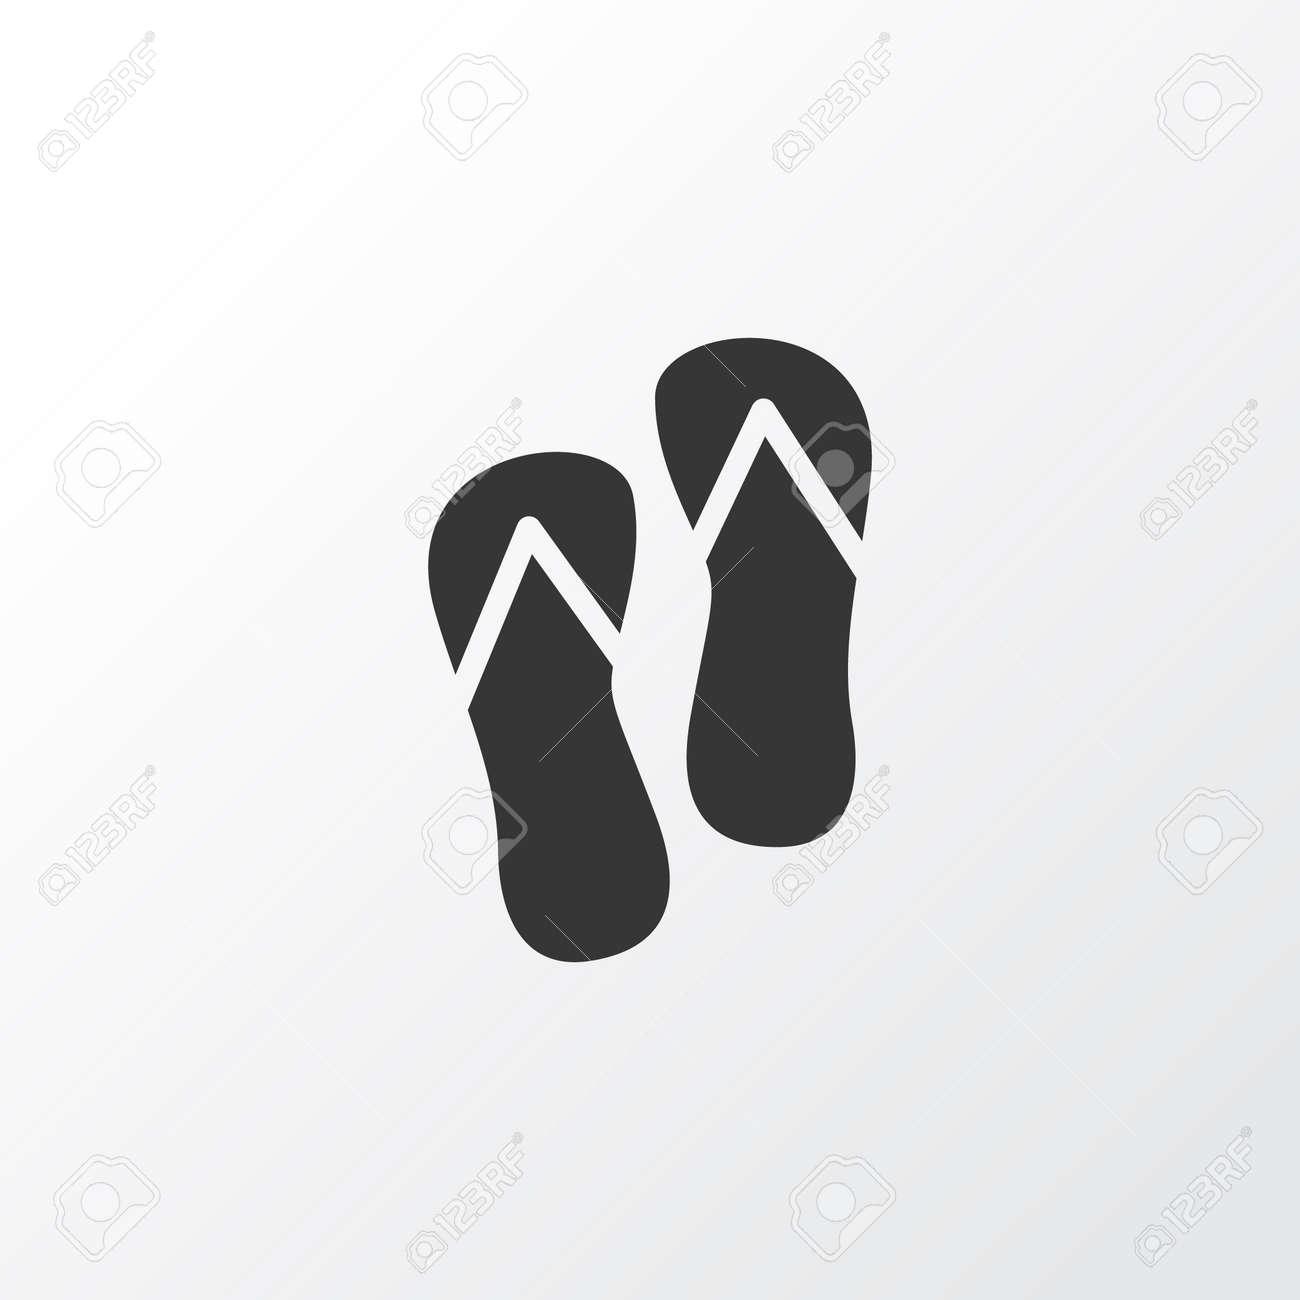 de1811351 Flip flops icon symbol. Premium quality isolated beach sandal element in  trendy style. Stock